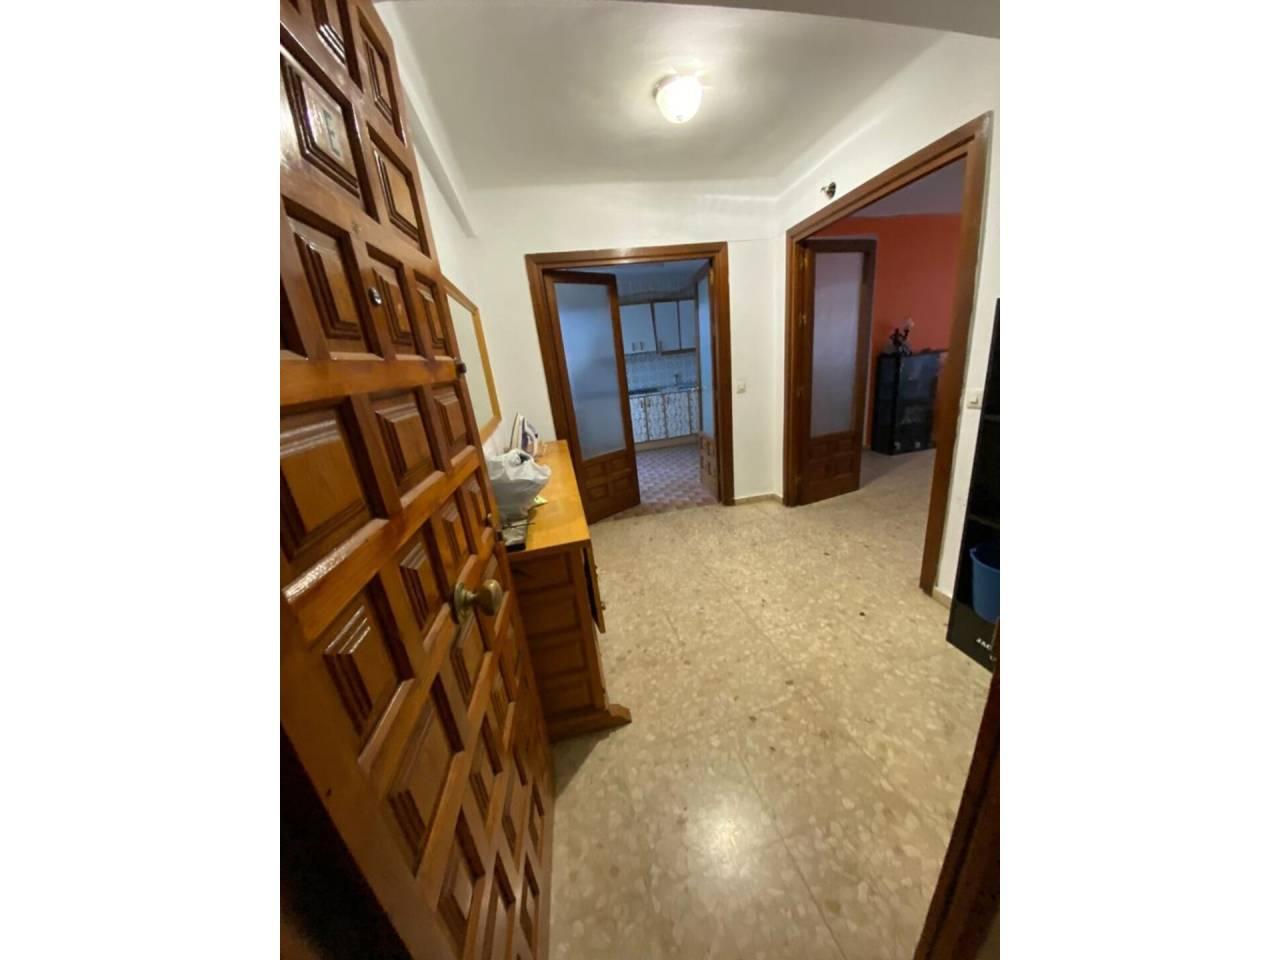 Piso en venta en Estepona en Casco Antiguo, Calle: San Roque